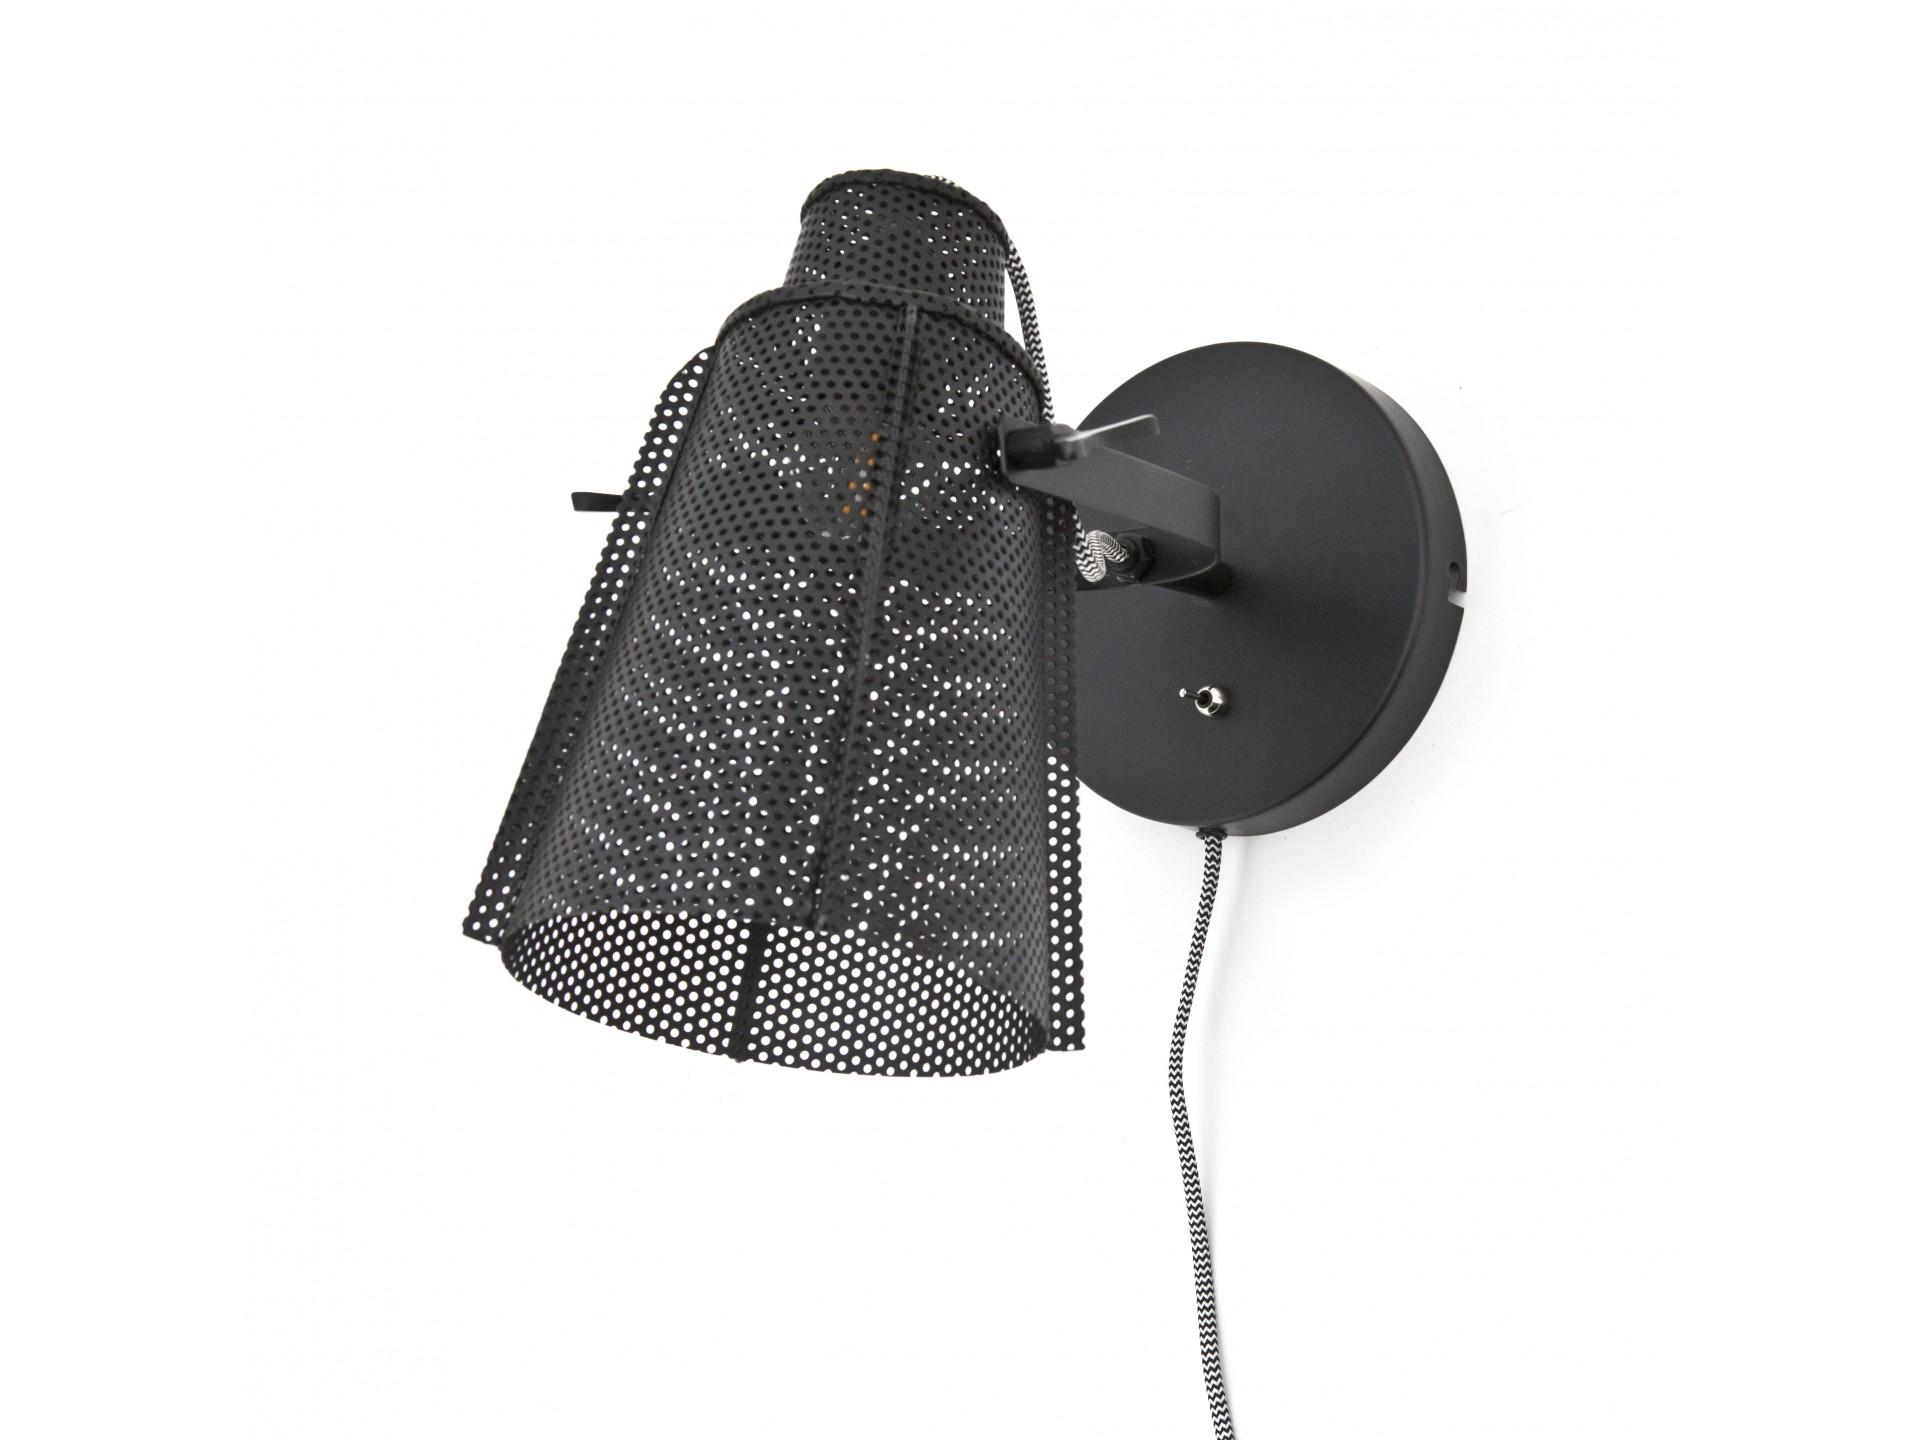 Wandlamp APOLLO Metaal Zwart